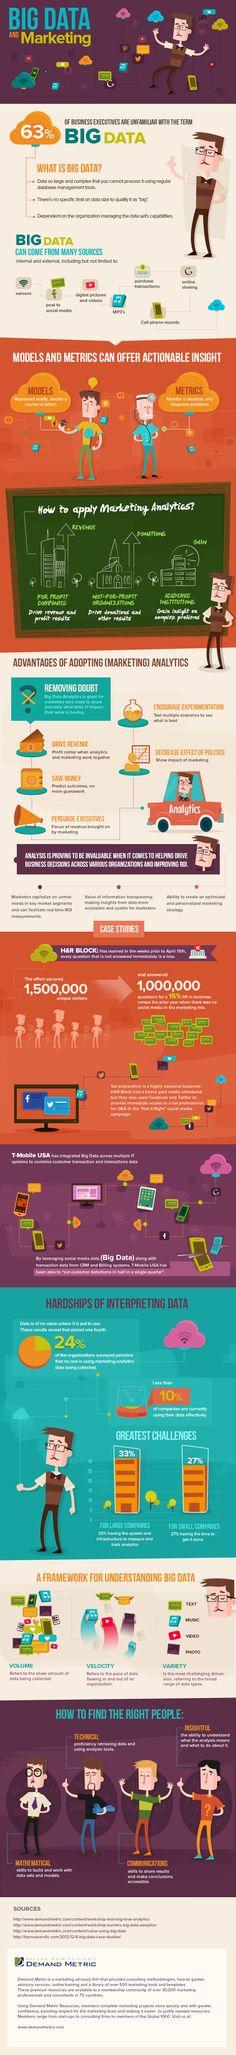 BIG #DATA and #Marketing [#infographic]